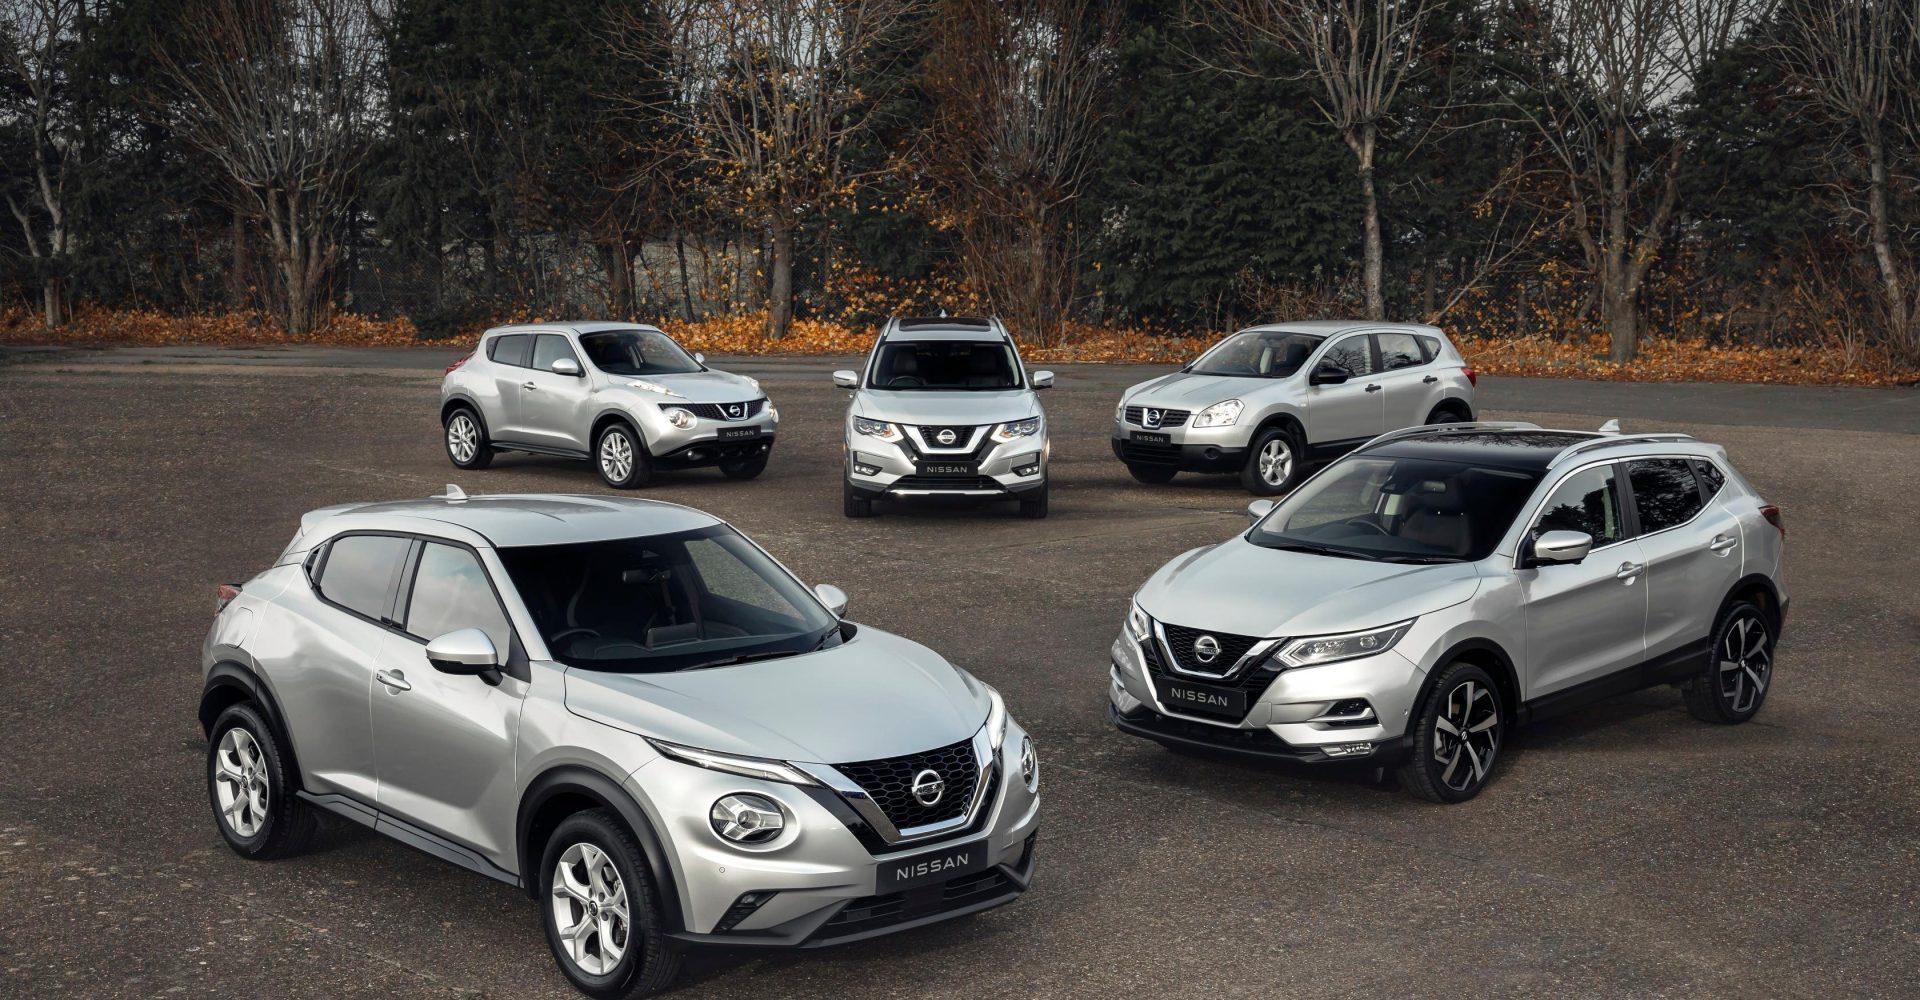 Nissan celebrates one million crossover sales